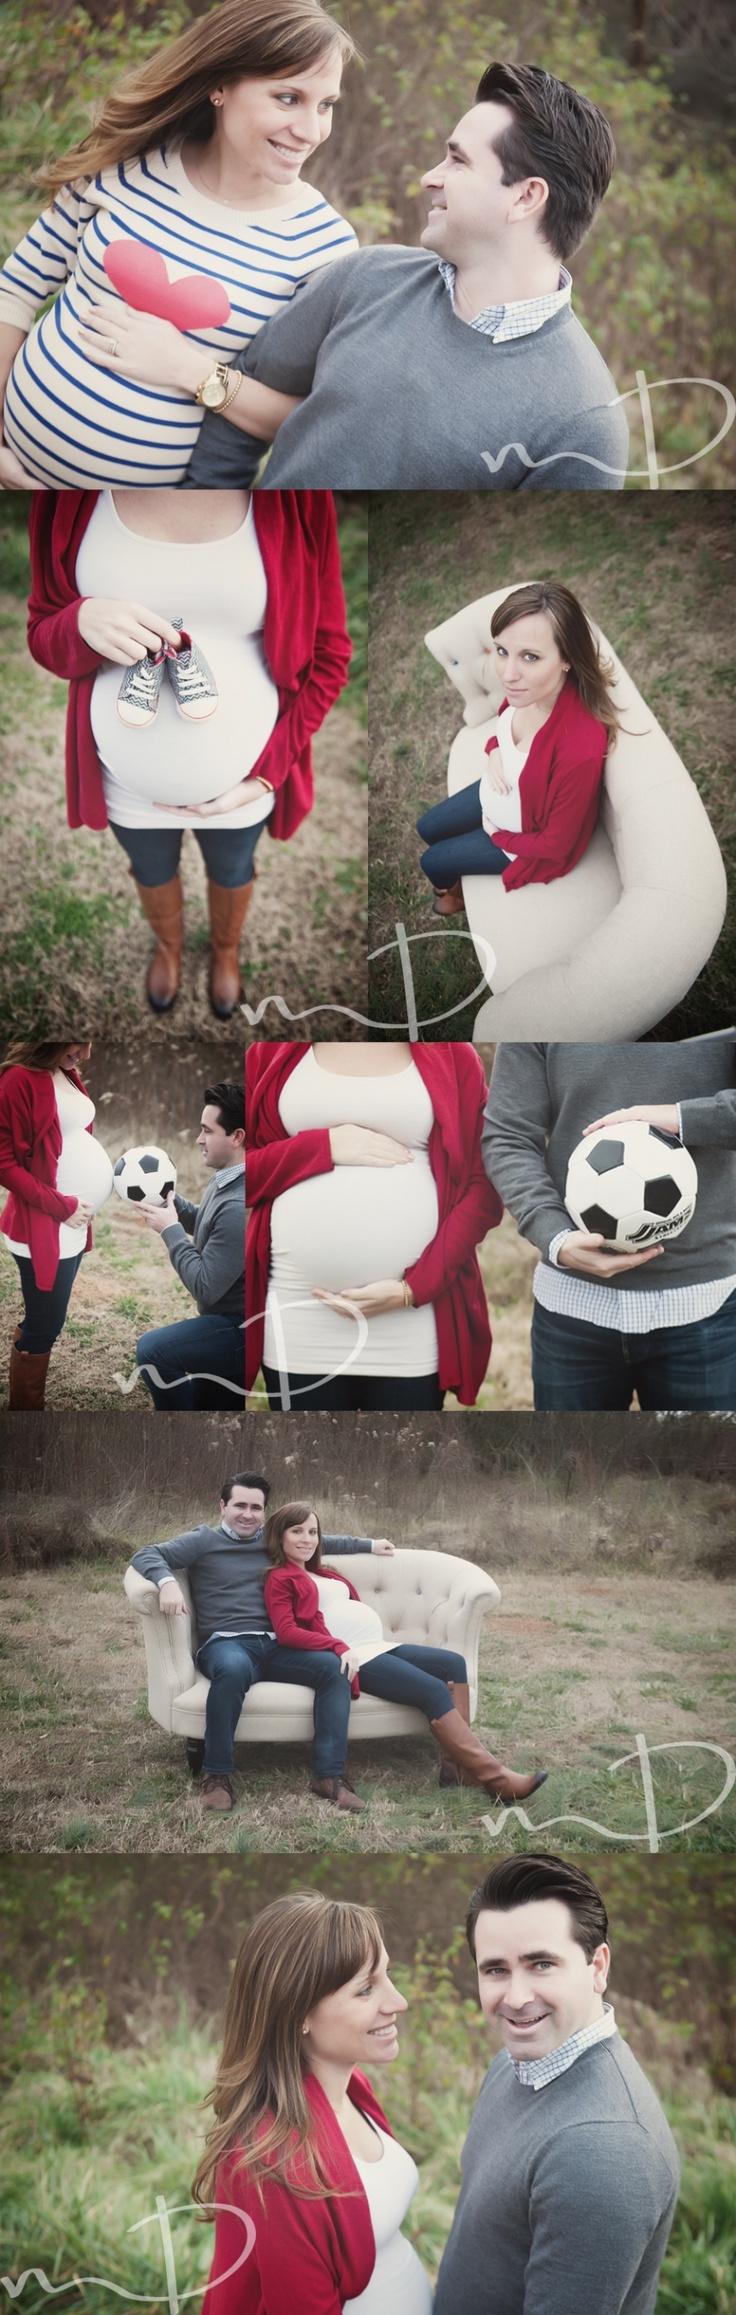 Maternity Photography - Molly Dockery Photography, Asheville, NC